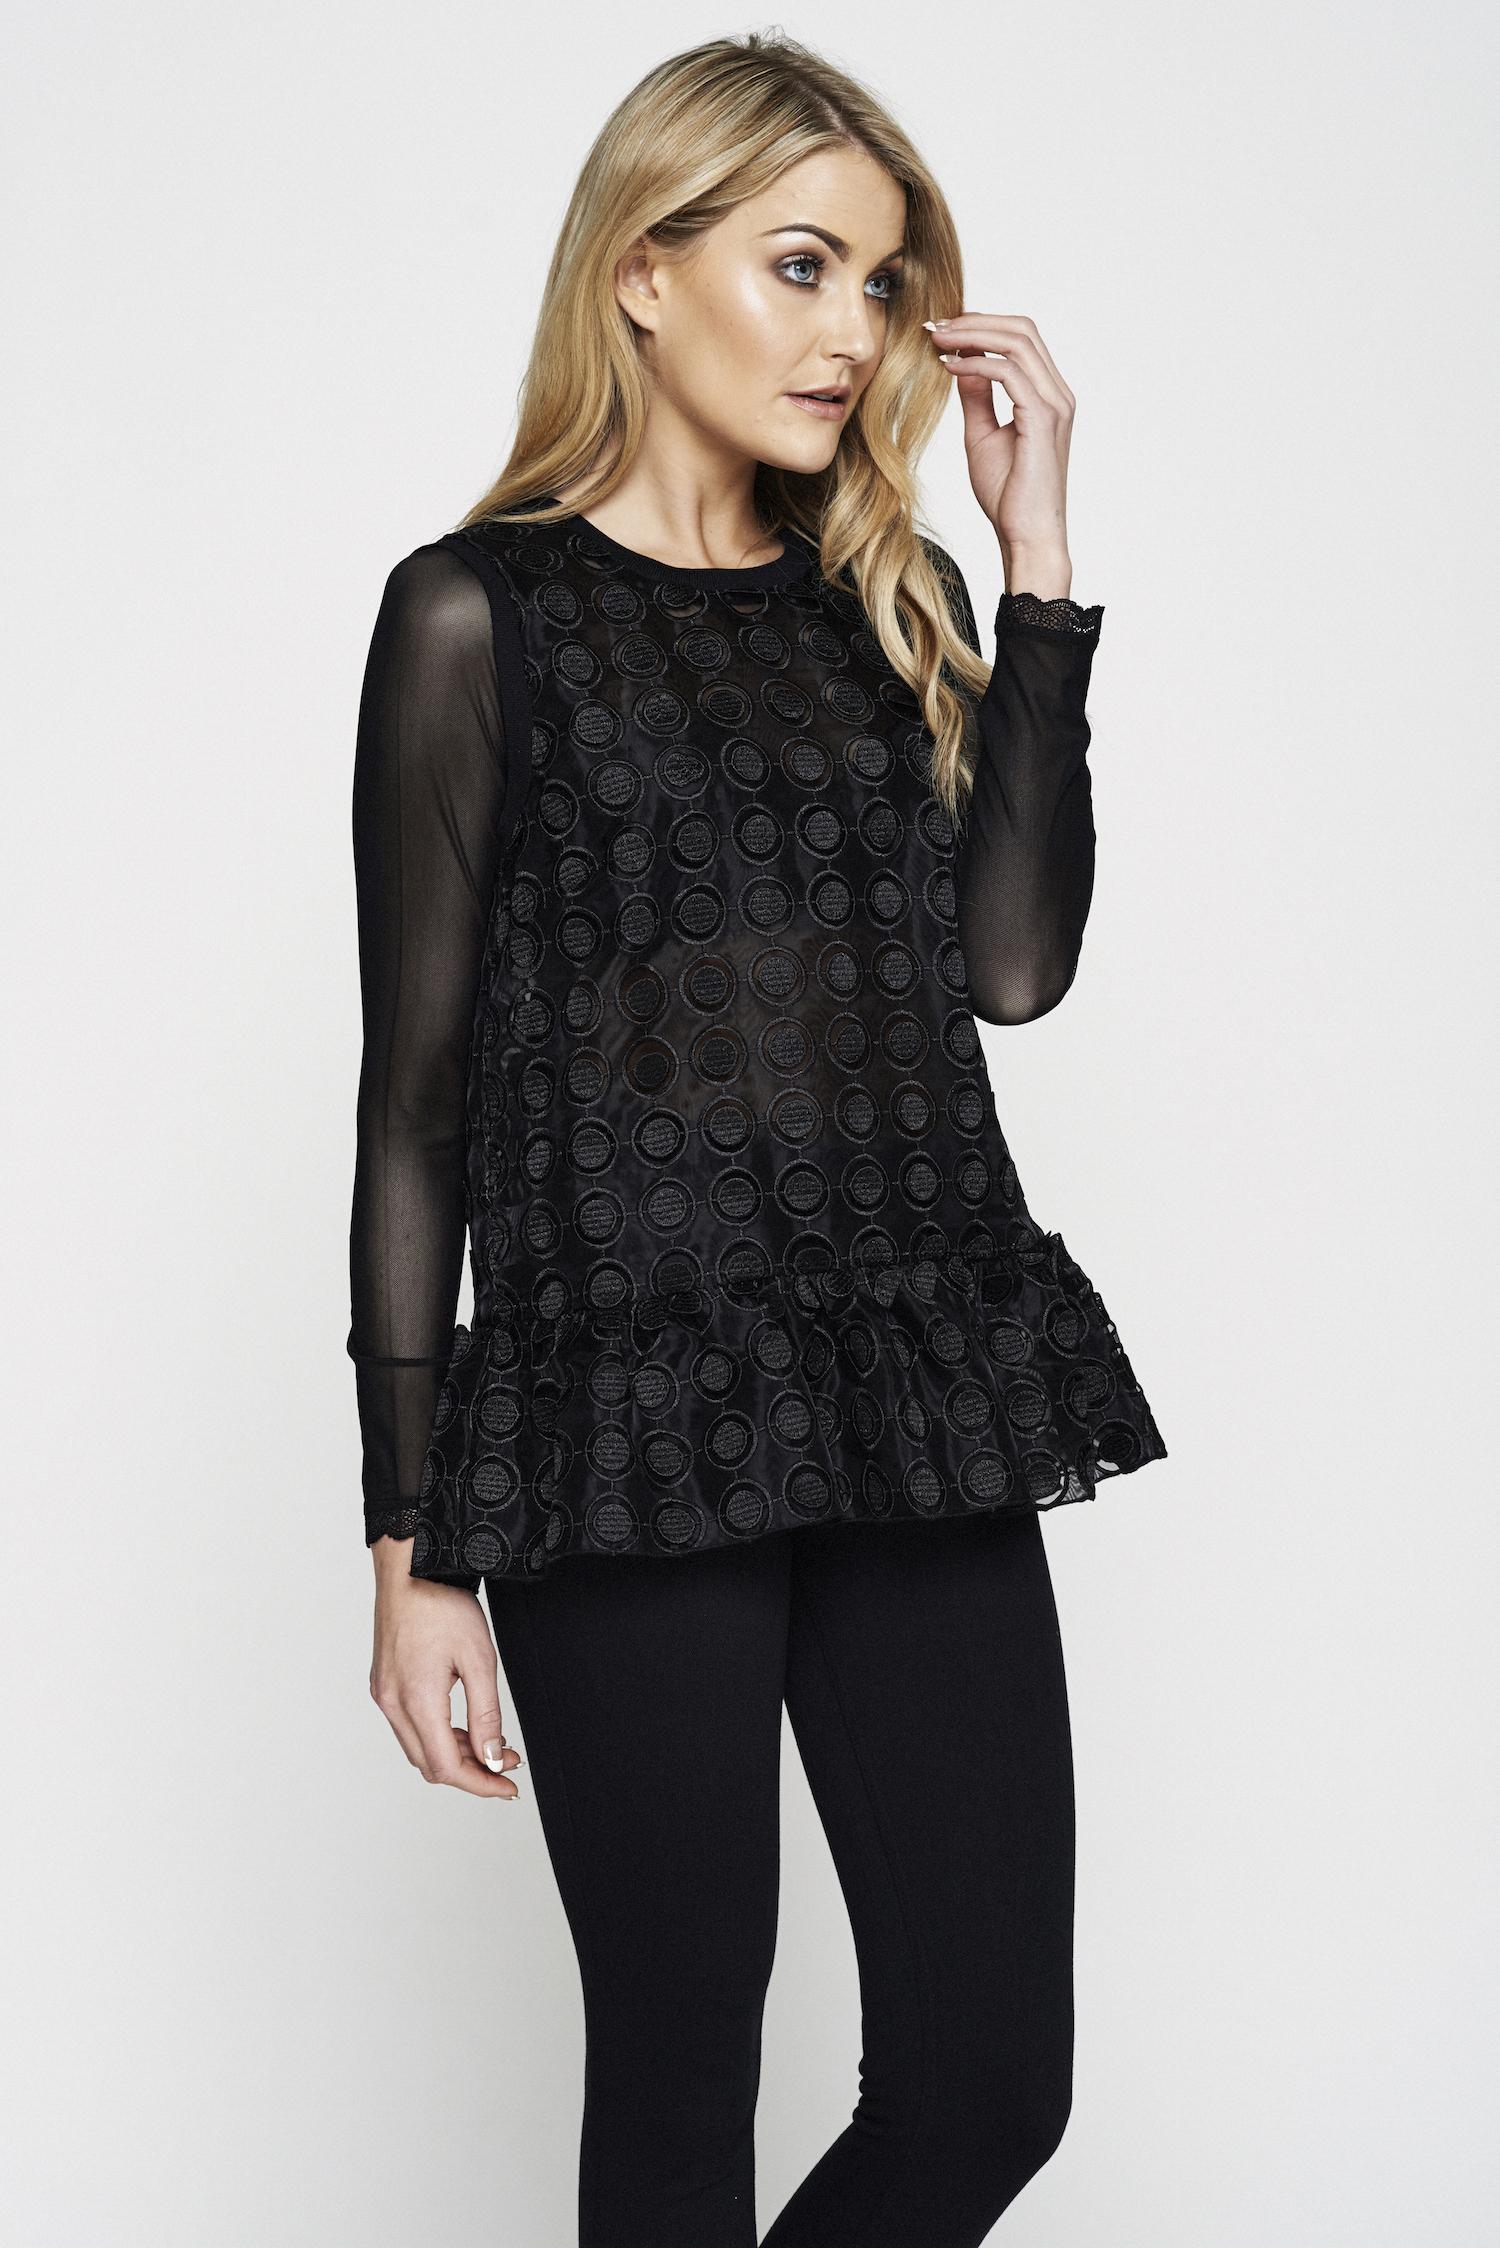 ca72292603db7 Sandz Black. Canopi Kerri Nicole0157 copy.jpg. Copy of Canopi Sandz  detachable secret sheer cover sleeves black lace trim